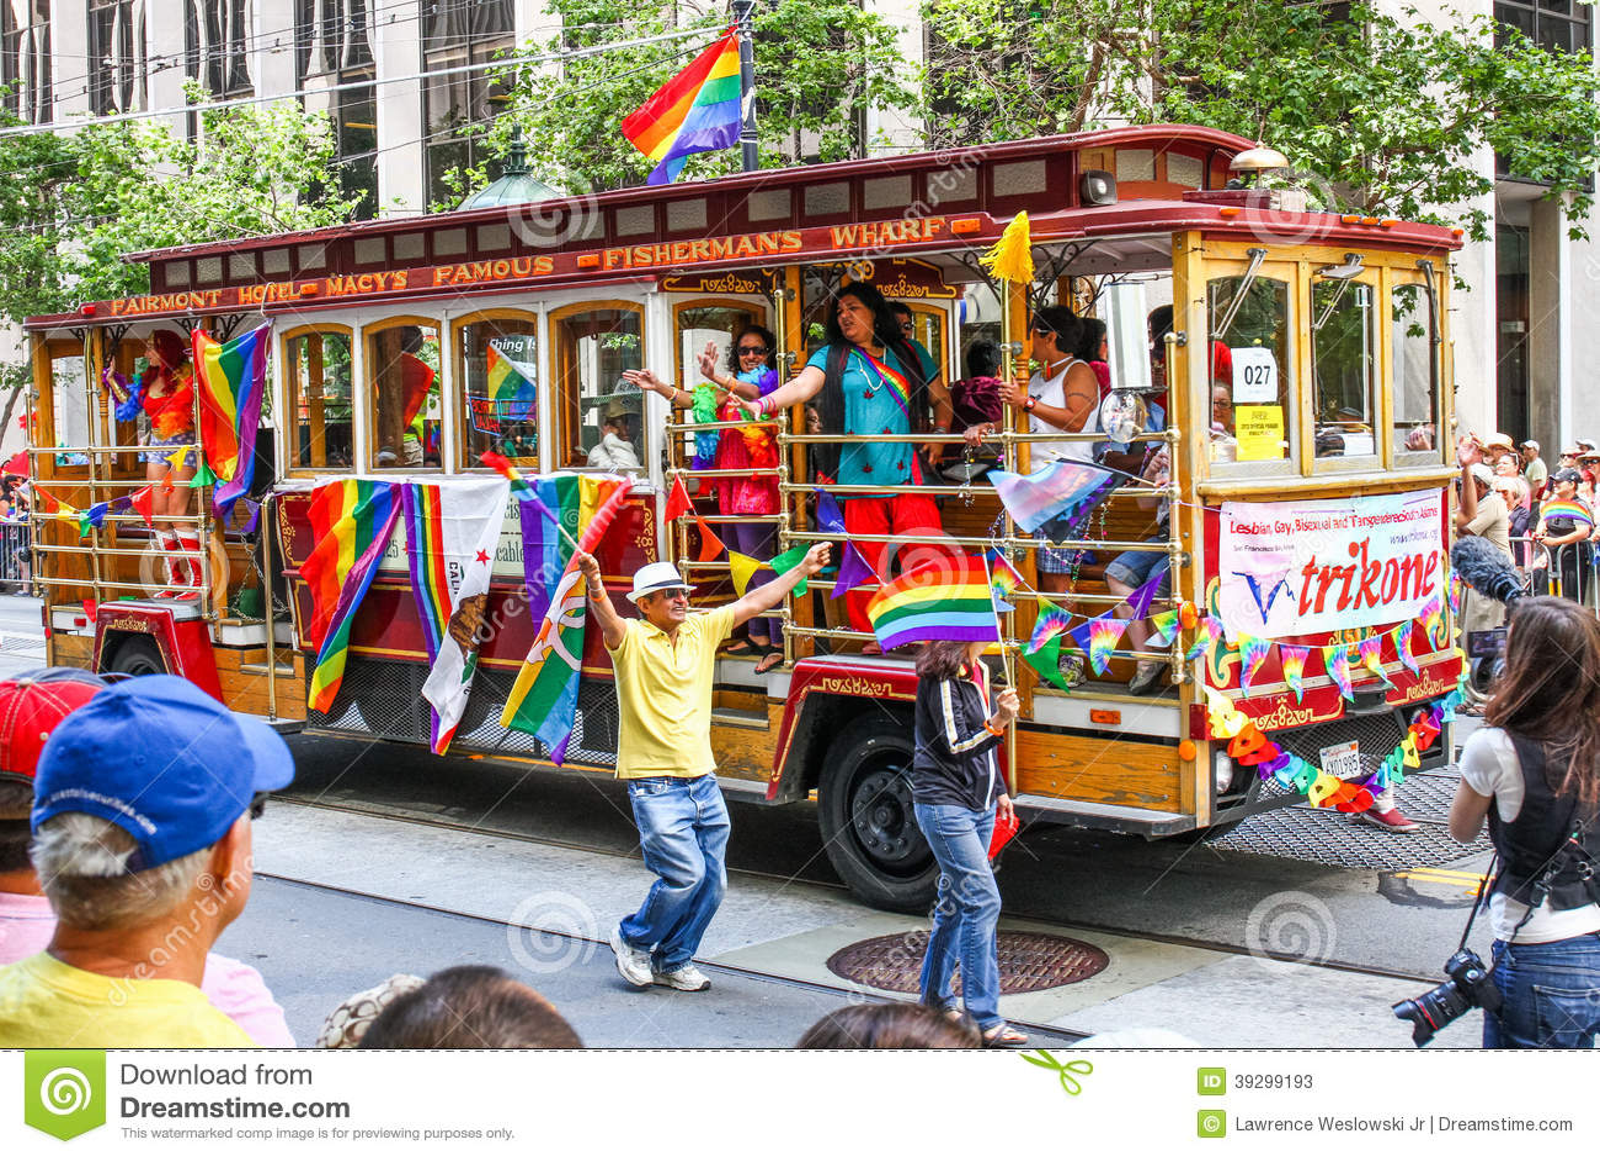 San Francisco Pride Parade Trikone LGBT Trolley Float Editorial Stock ...: http://www.dreamstime.com/stock-photos-san-francisco-pride-parade-trikone-lgbt-trolley-float-group-lesbian-gay-bisexual-transgender-members-supporters-image39299193